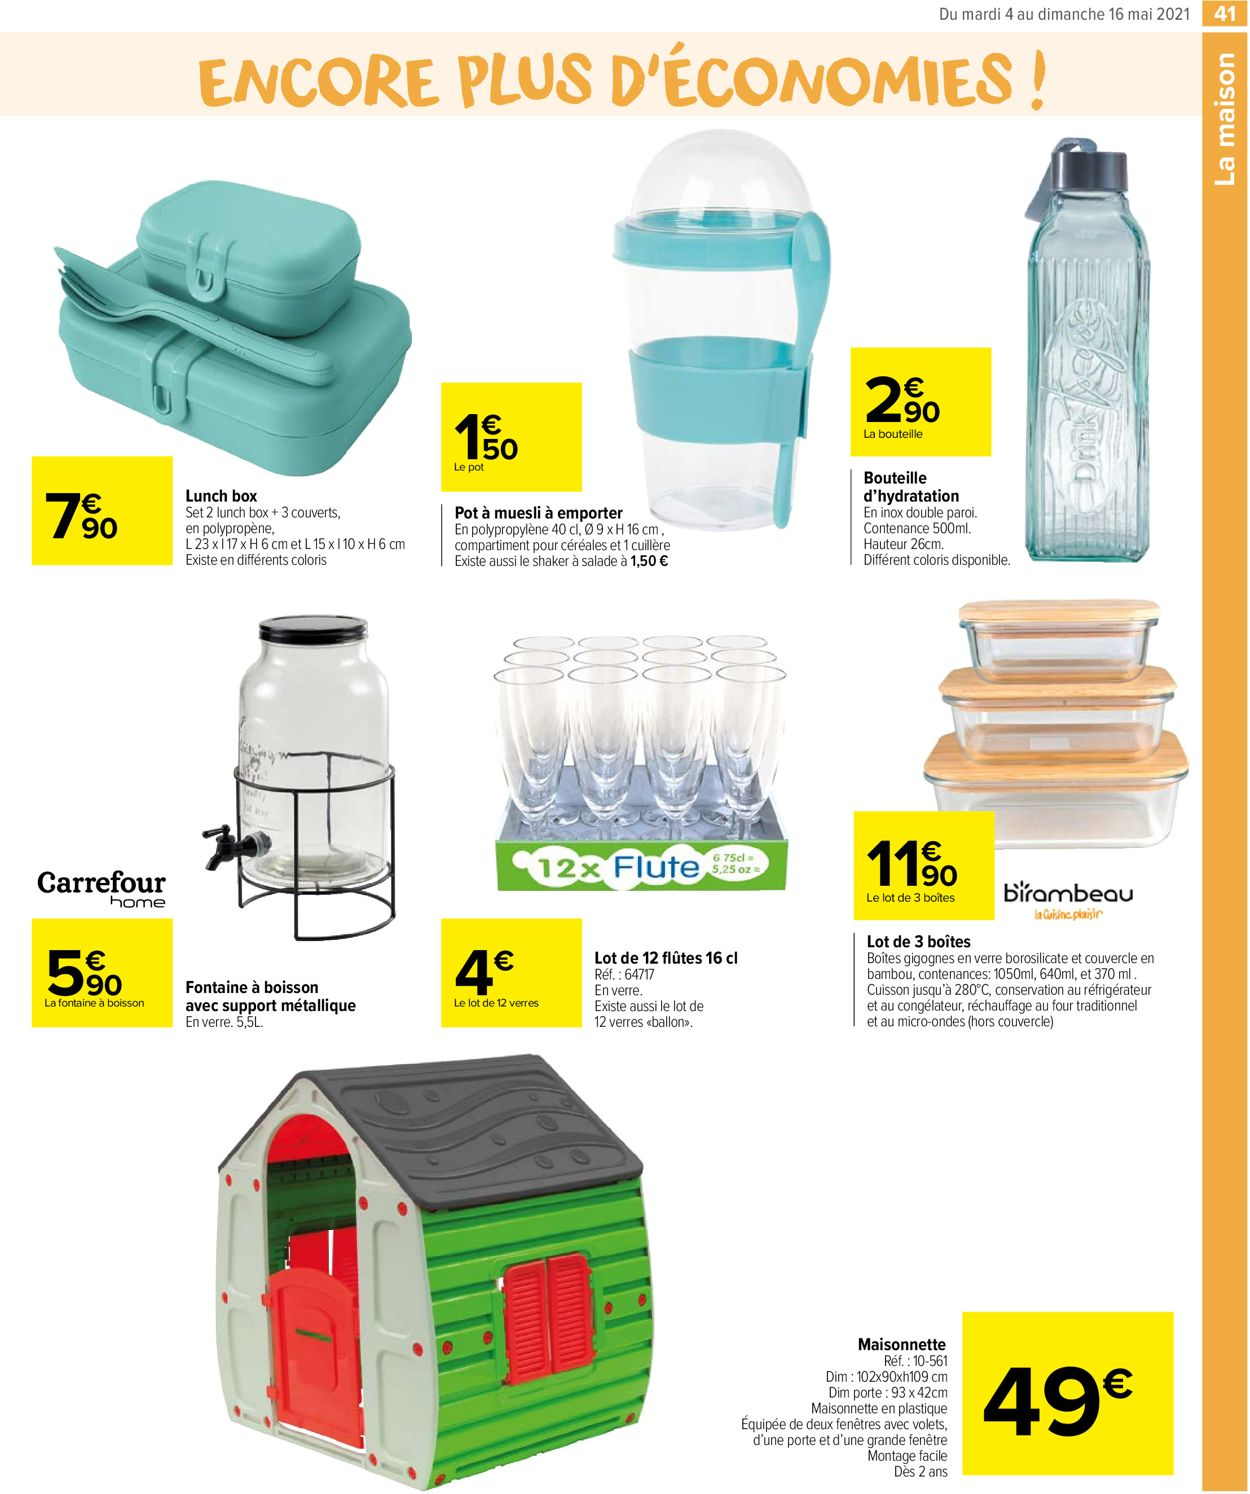 Carrefour Catalogue - 04.05-16.05.2021 (Page 3)